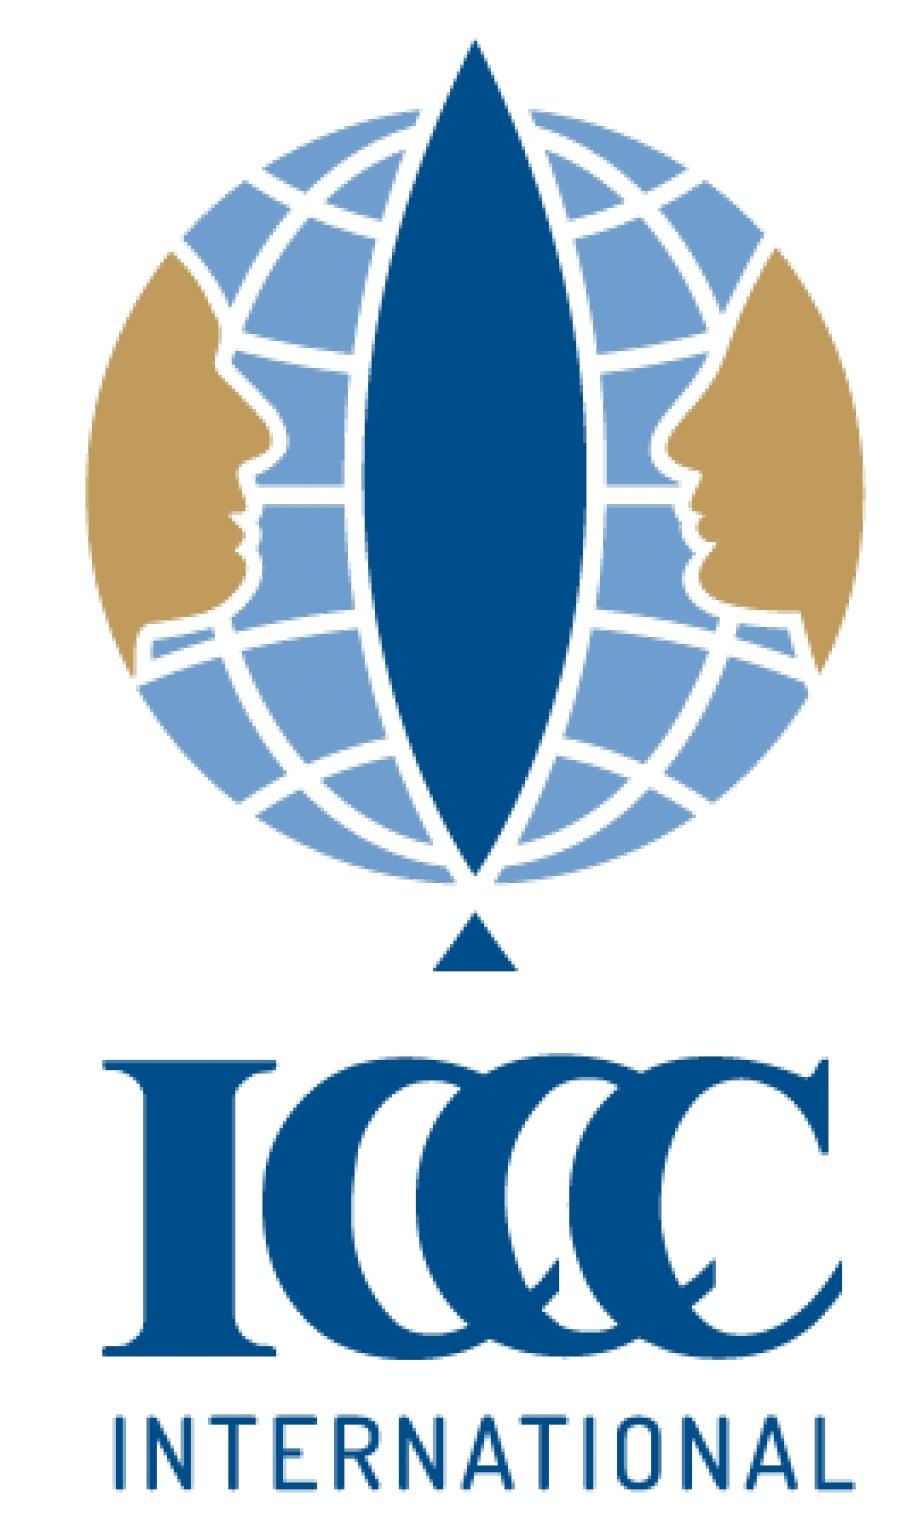 ICCC Deutschland e. V.